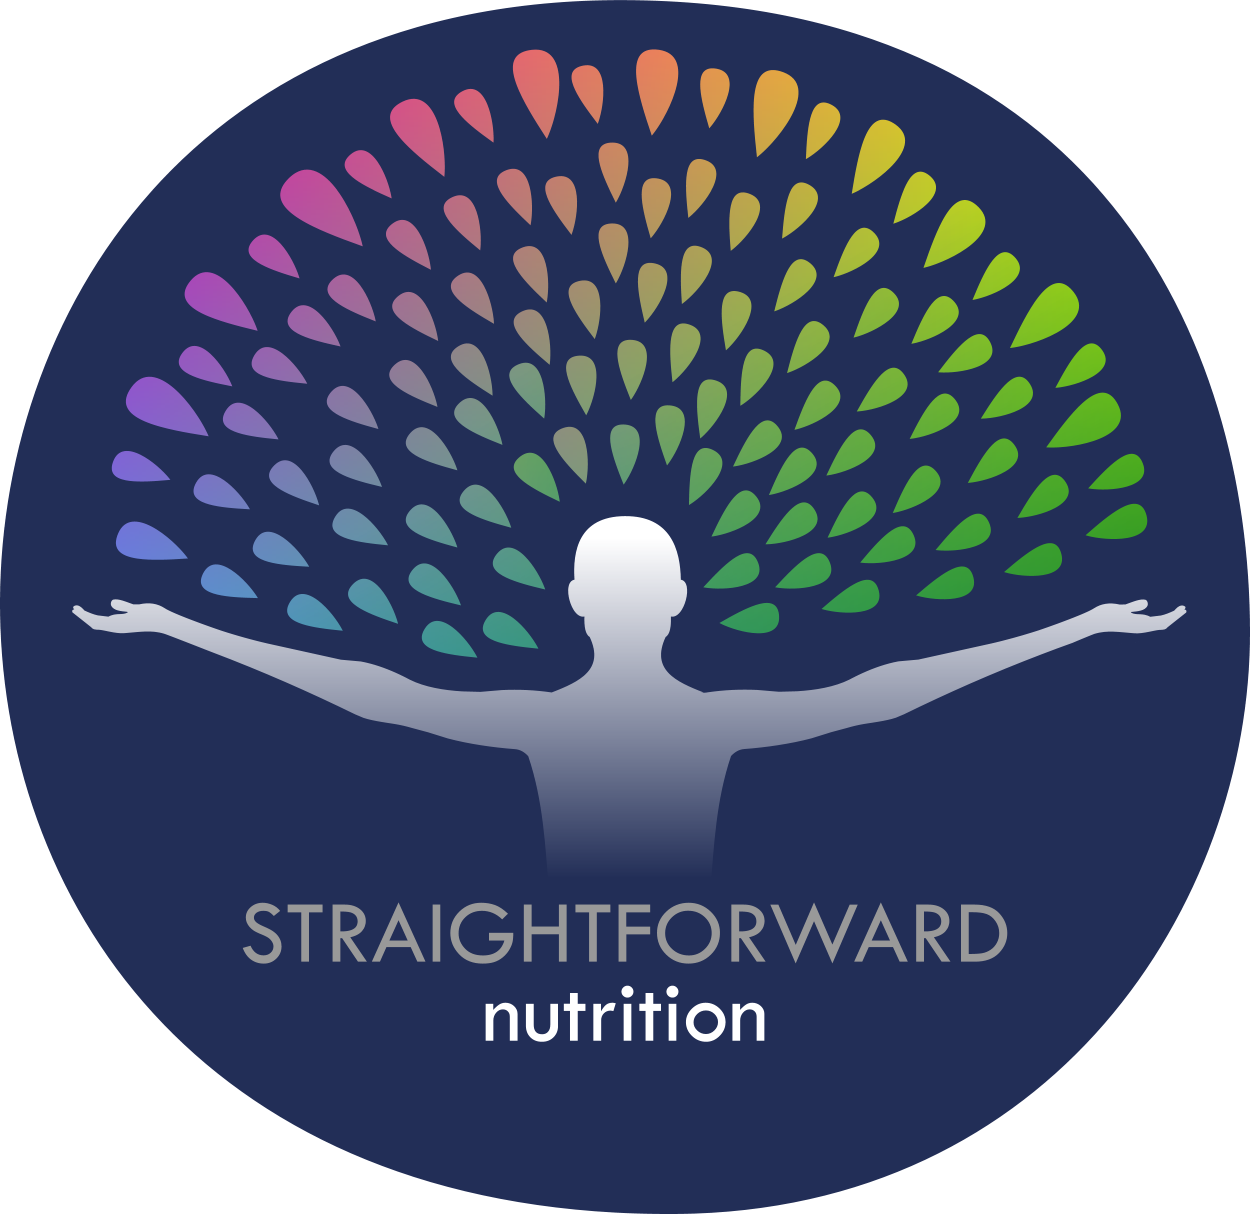 Straightforward Nutrition